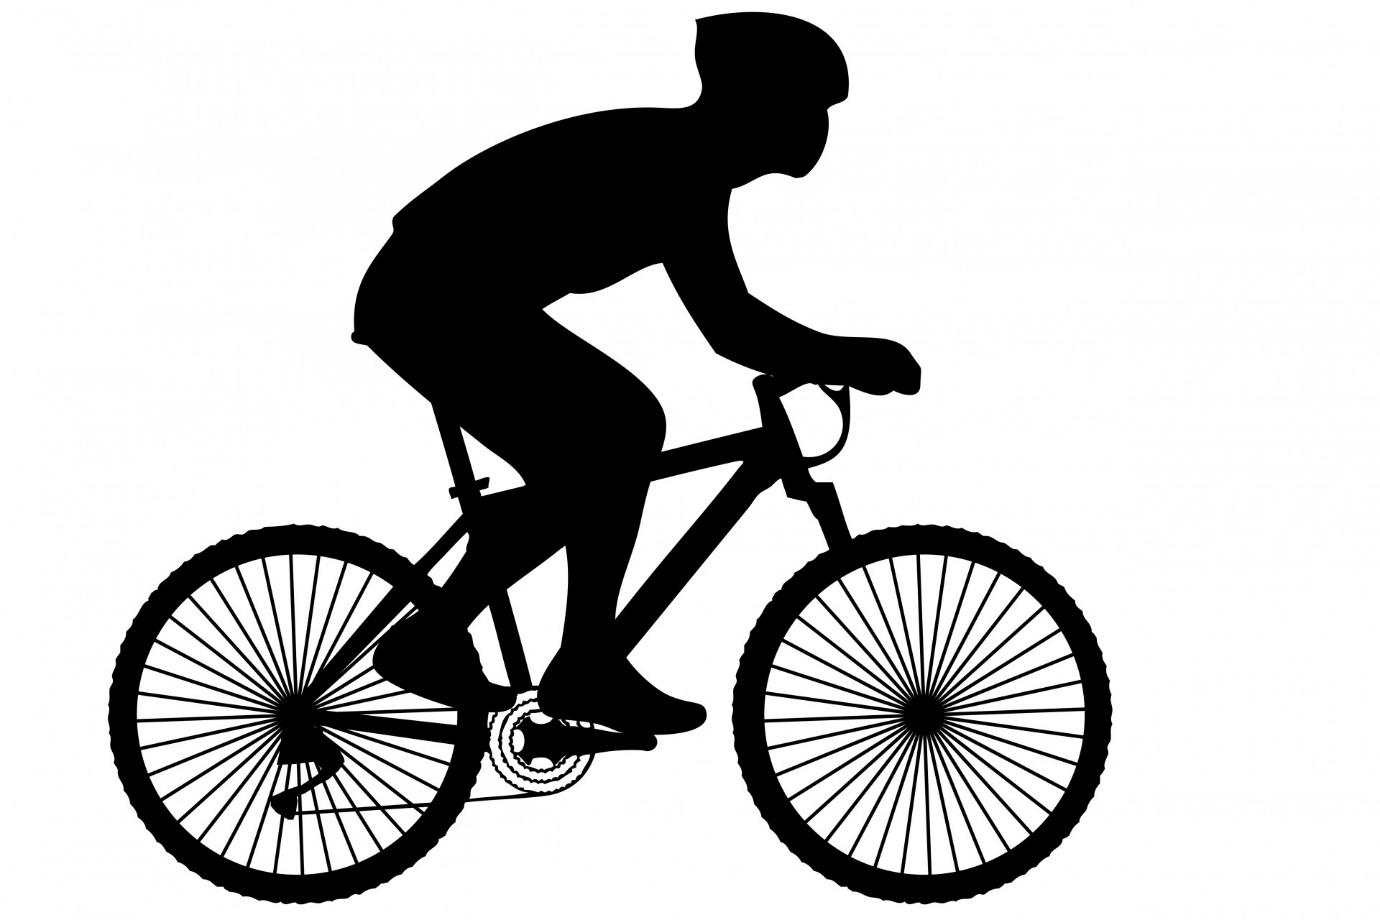 Cyclist Black Silhouette Clipart Free Stock Photo - Public ...